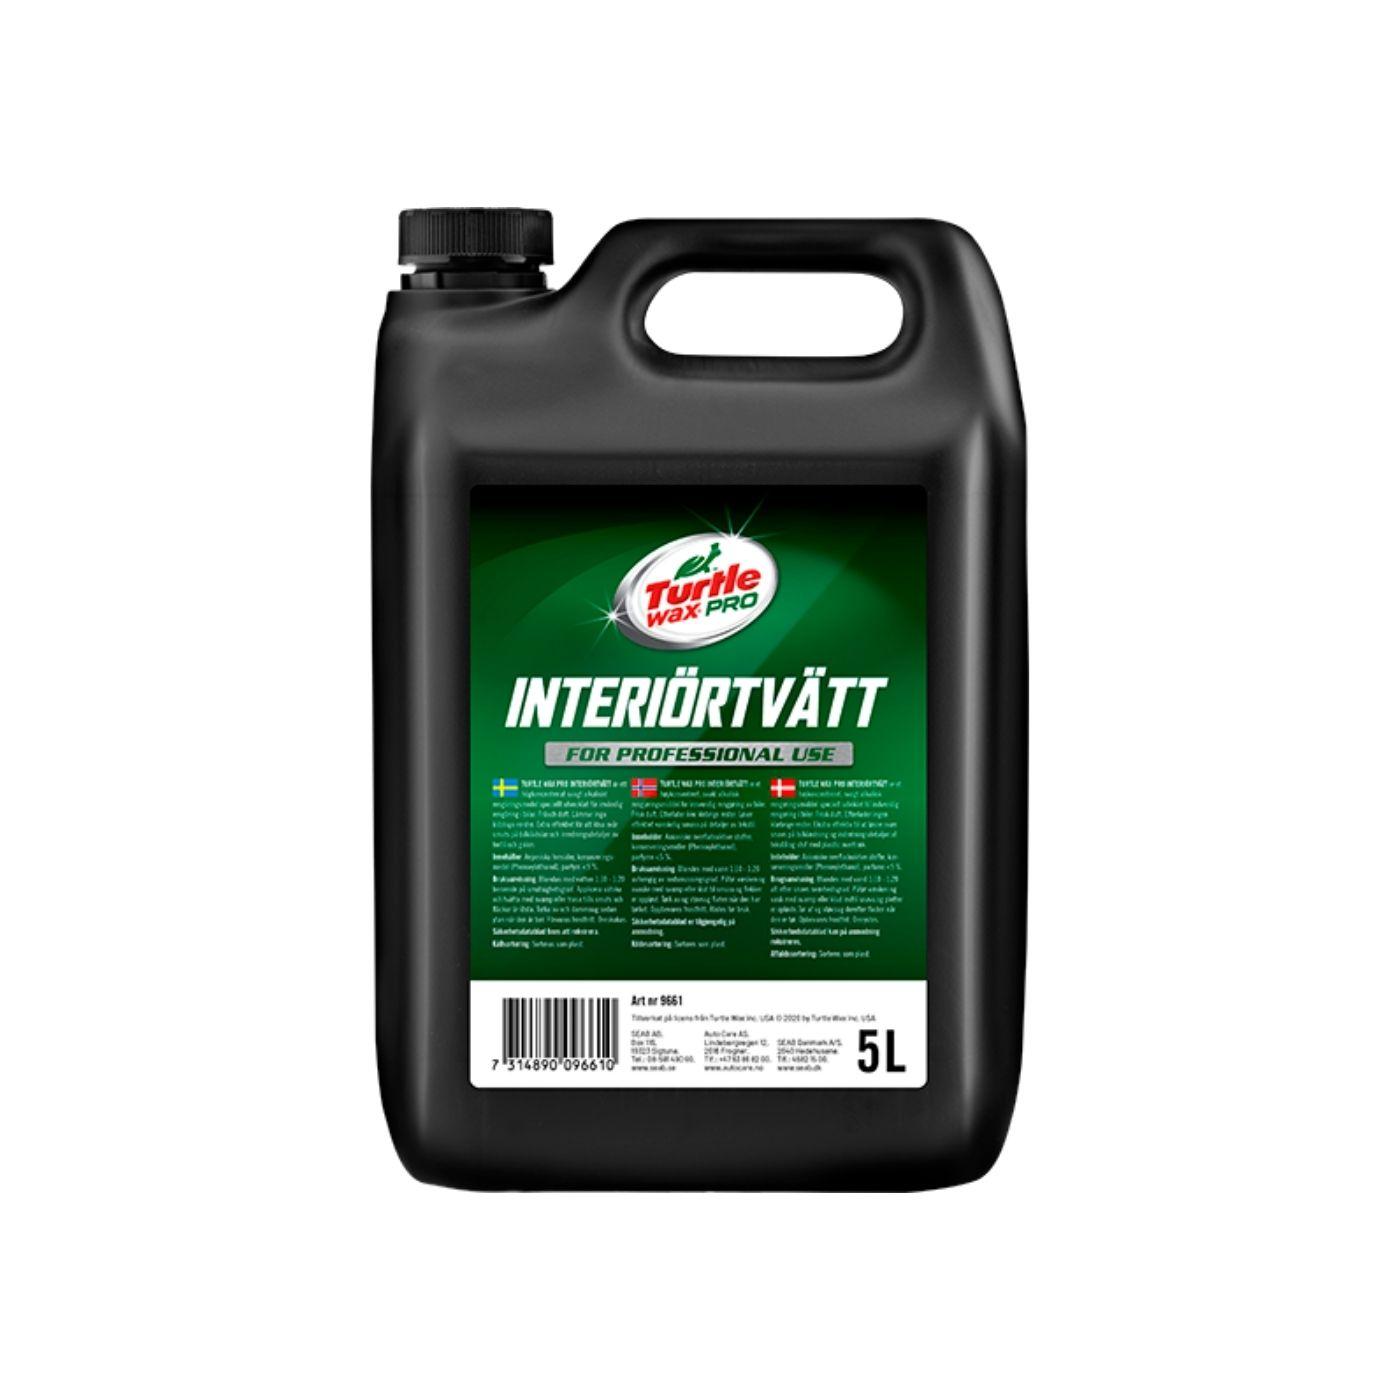 Interiörrengöring Turtle Wax Pro Interiörtvätt, 5000 ml